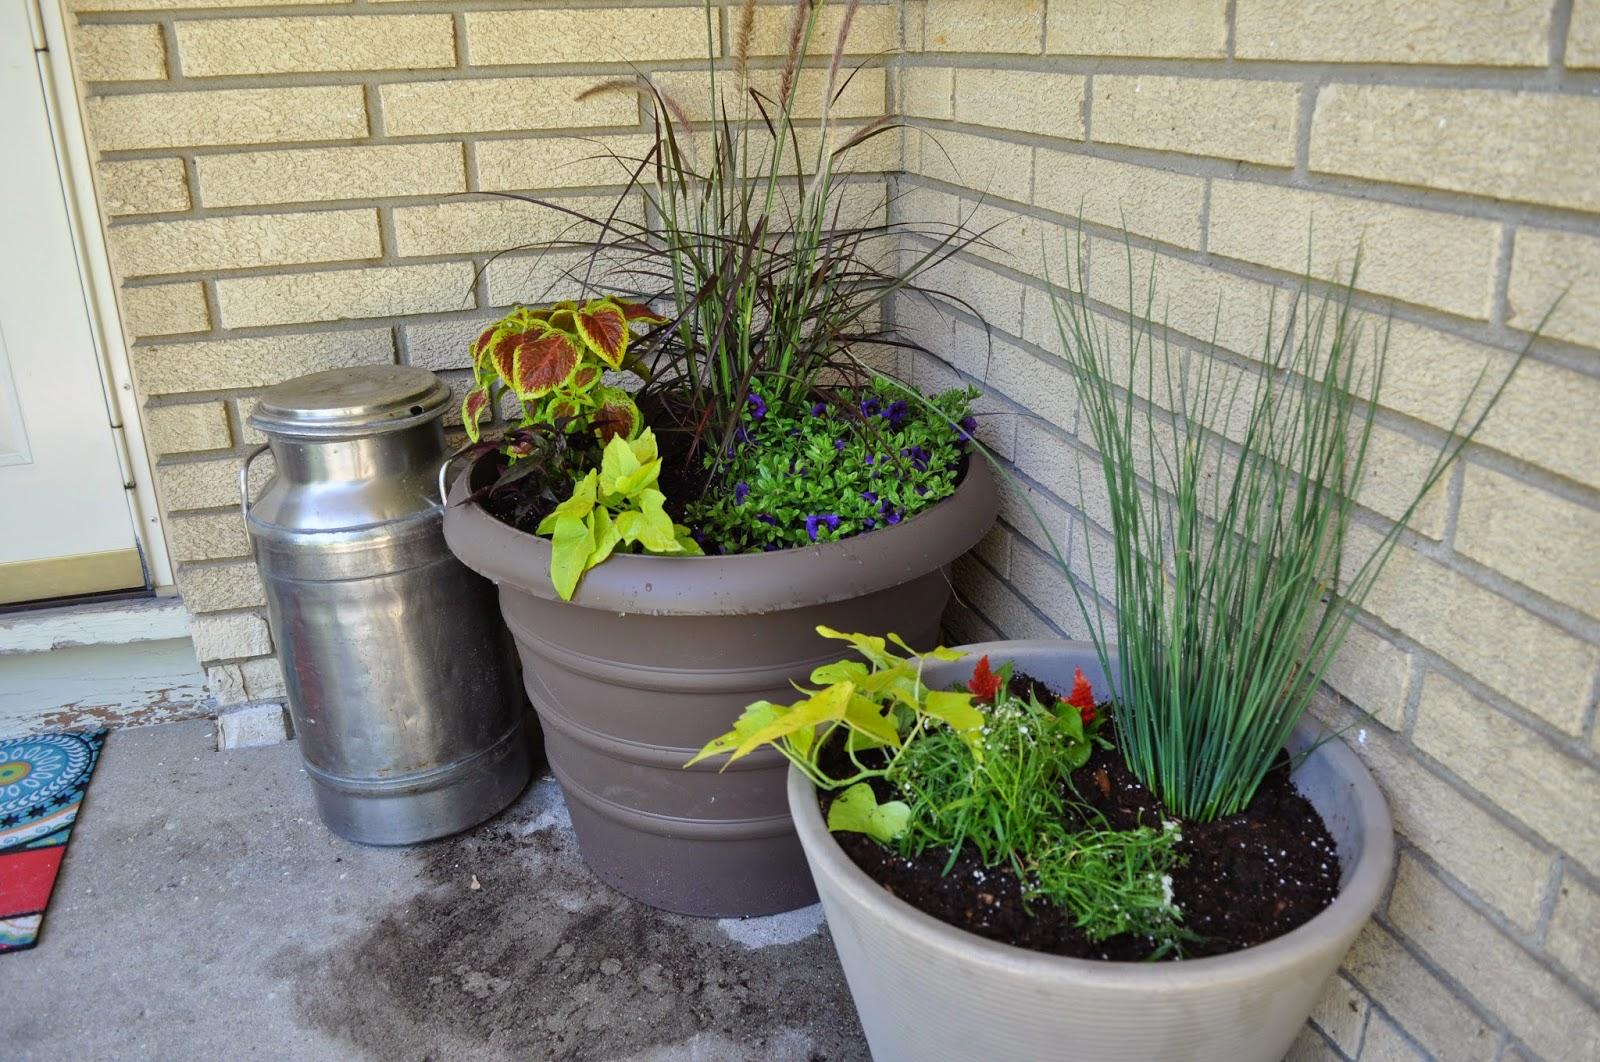 plants, sprucing up, front entry, new house, outside, painting, paint, potato vines, grasses, coleus